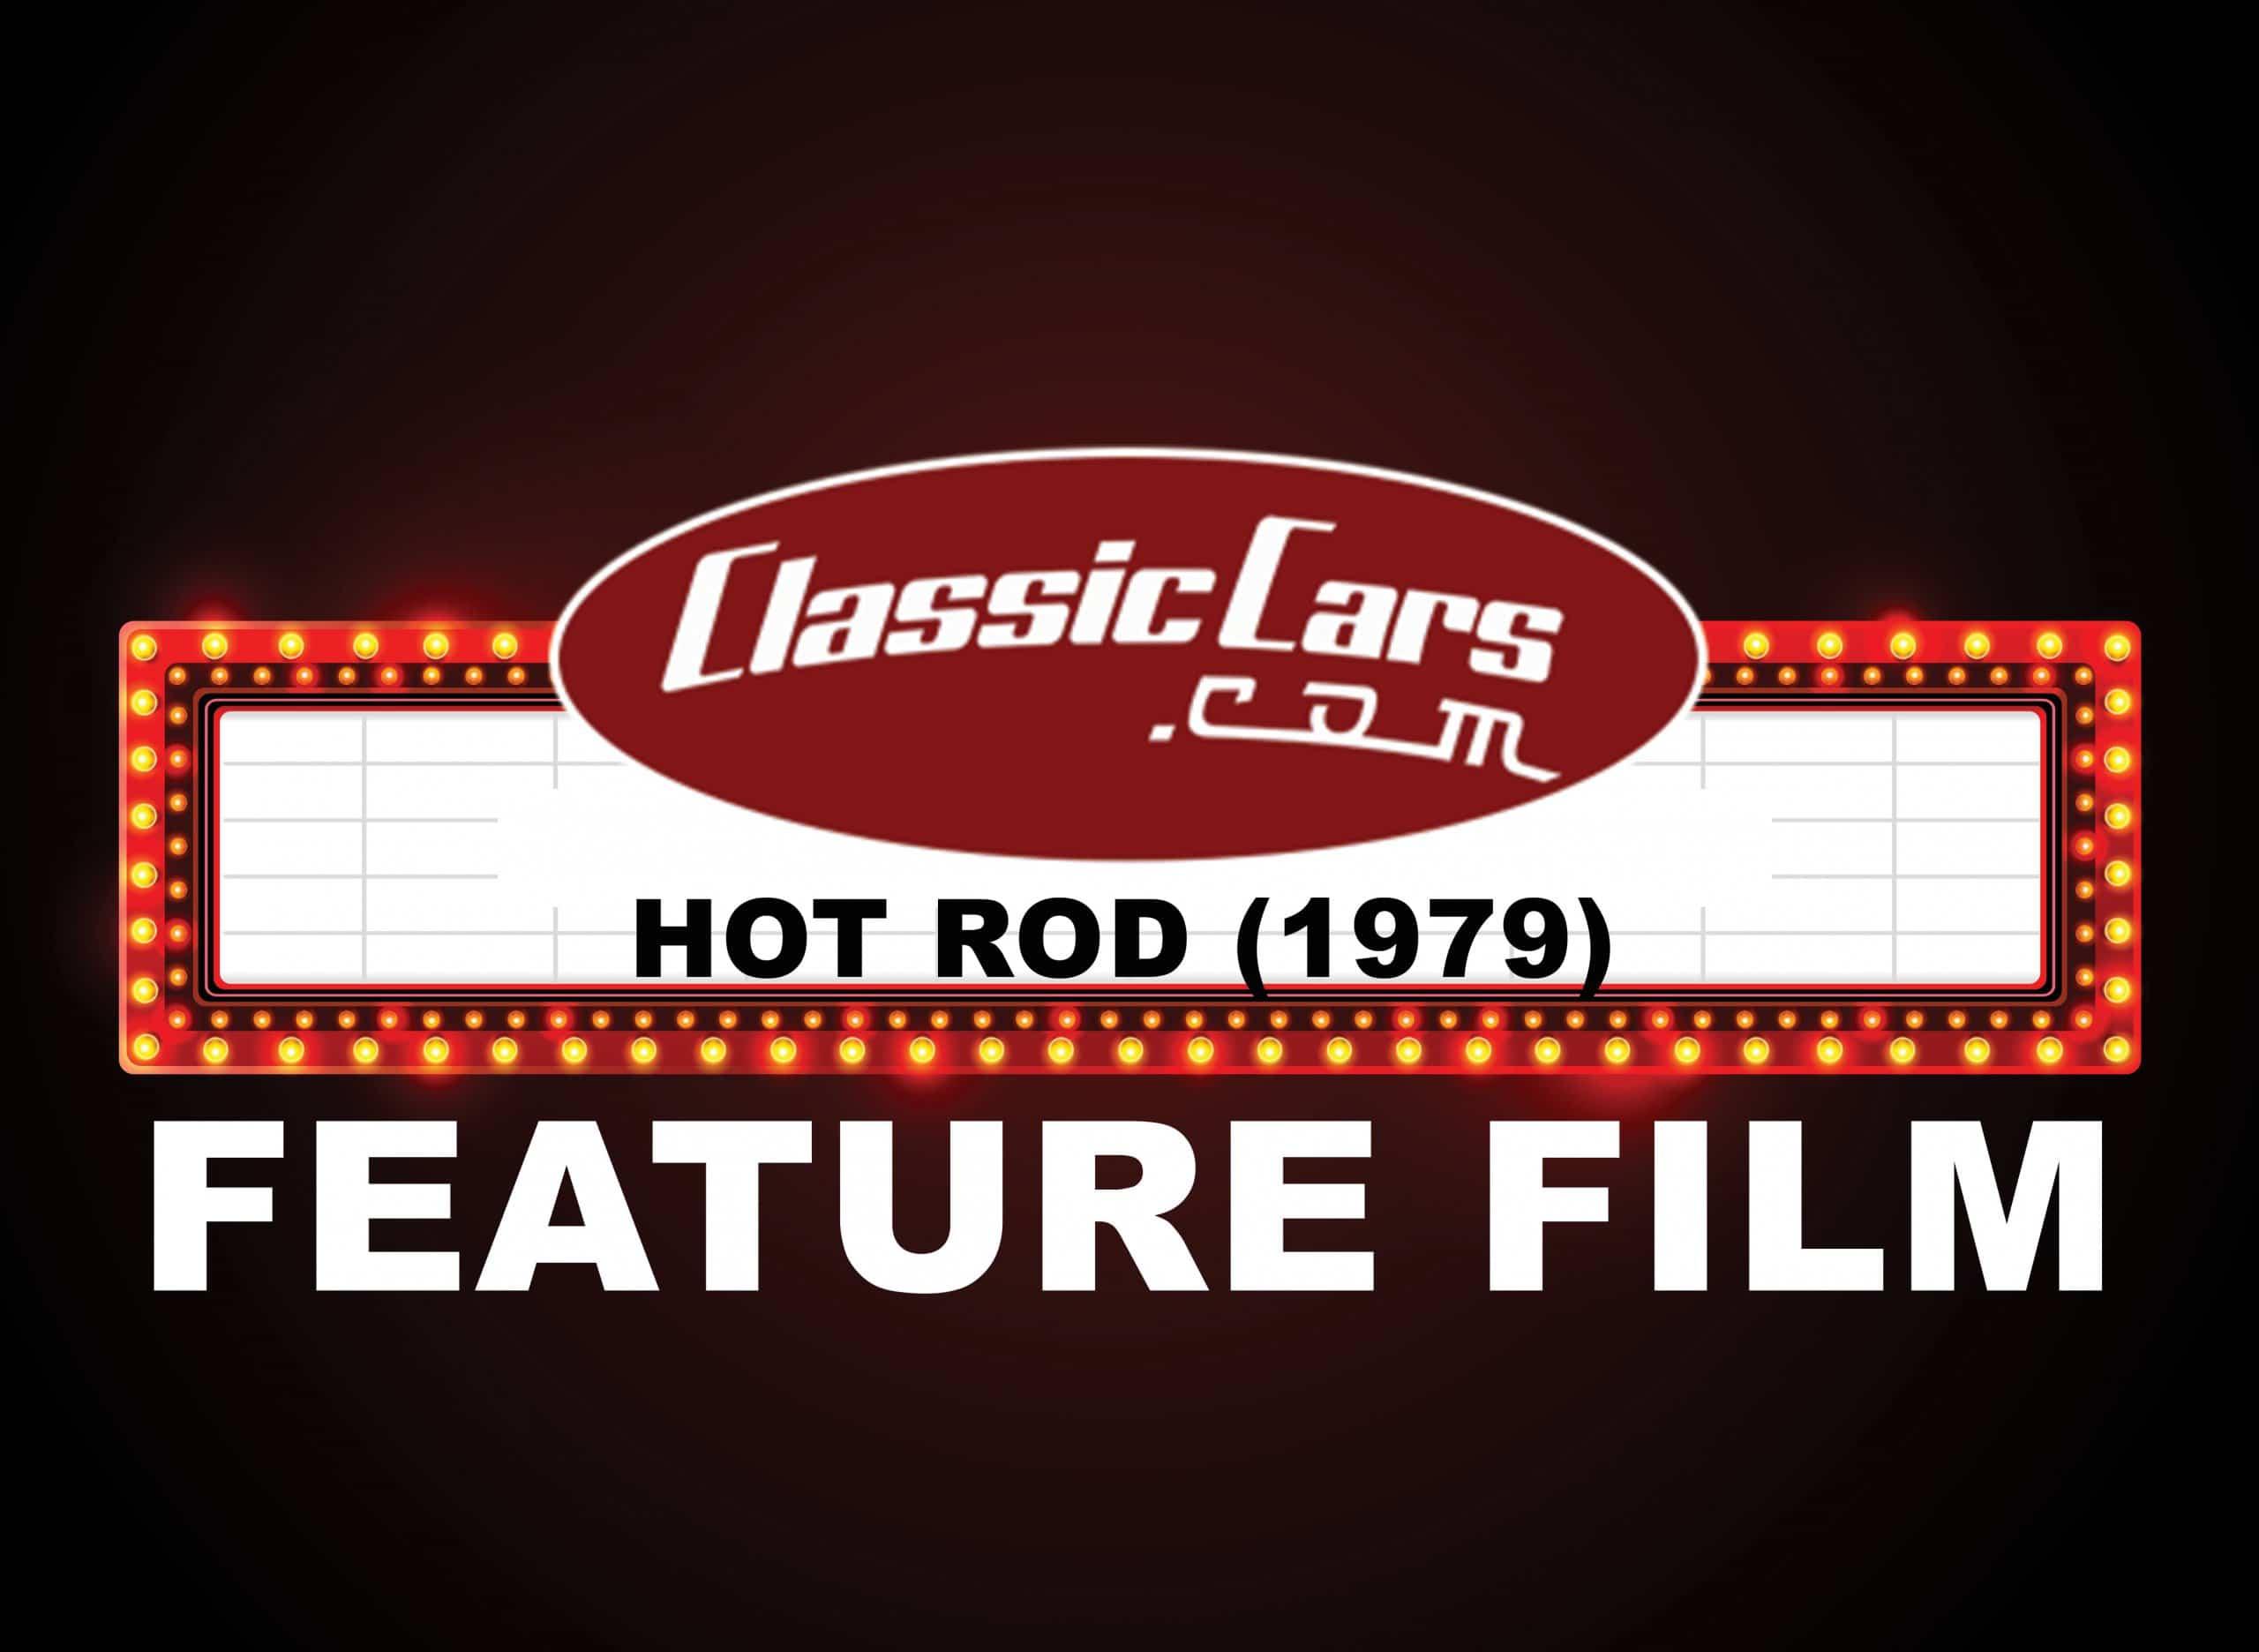 Sunday Film: Hot Rod (1979)